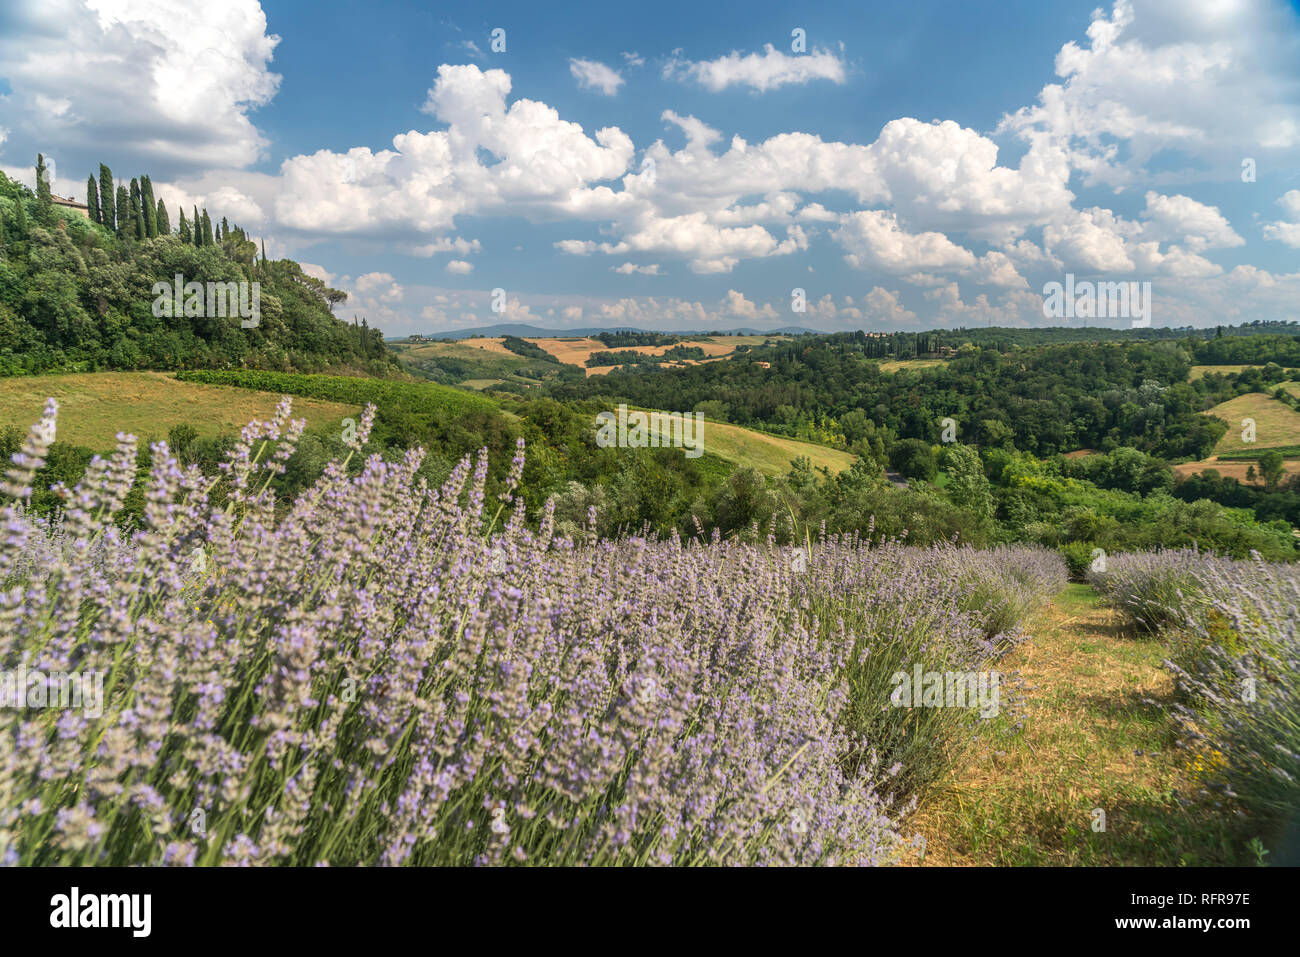 Typische toskanische Landschaft bei San Gimignano, Toskana, Italien  |   typical tuscan landscape around San Gimignano, Tuscany, Italy - Stock Image